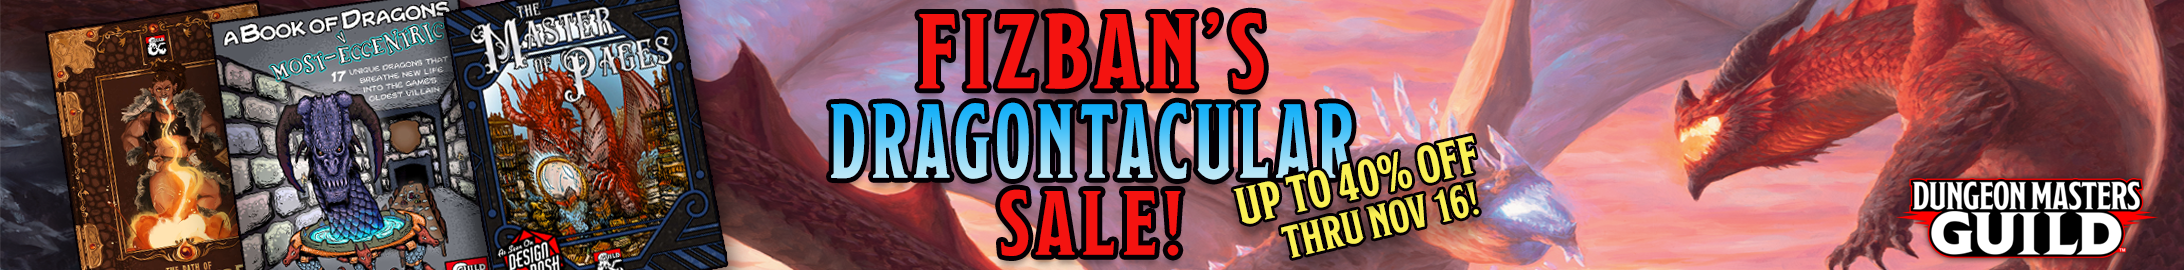 Fizban's Dragontacular Sale